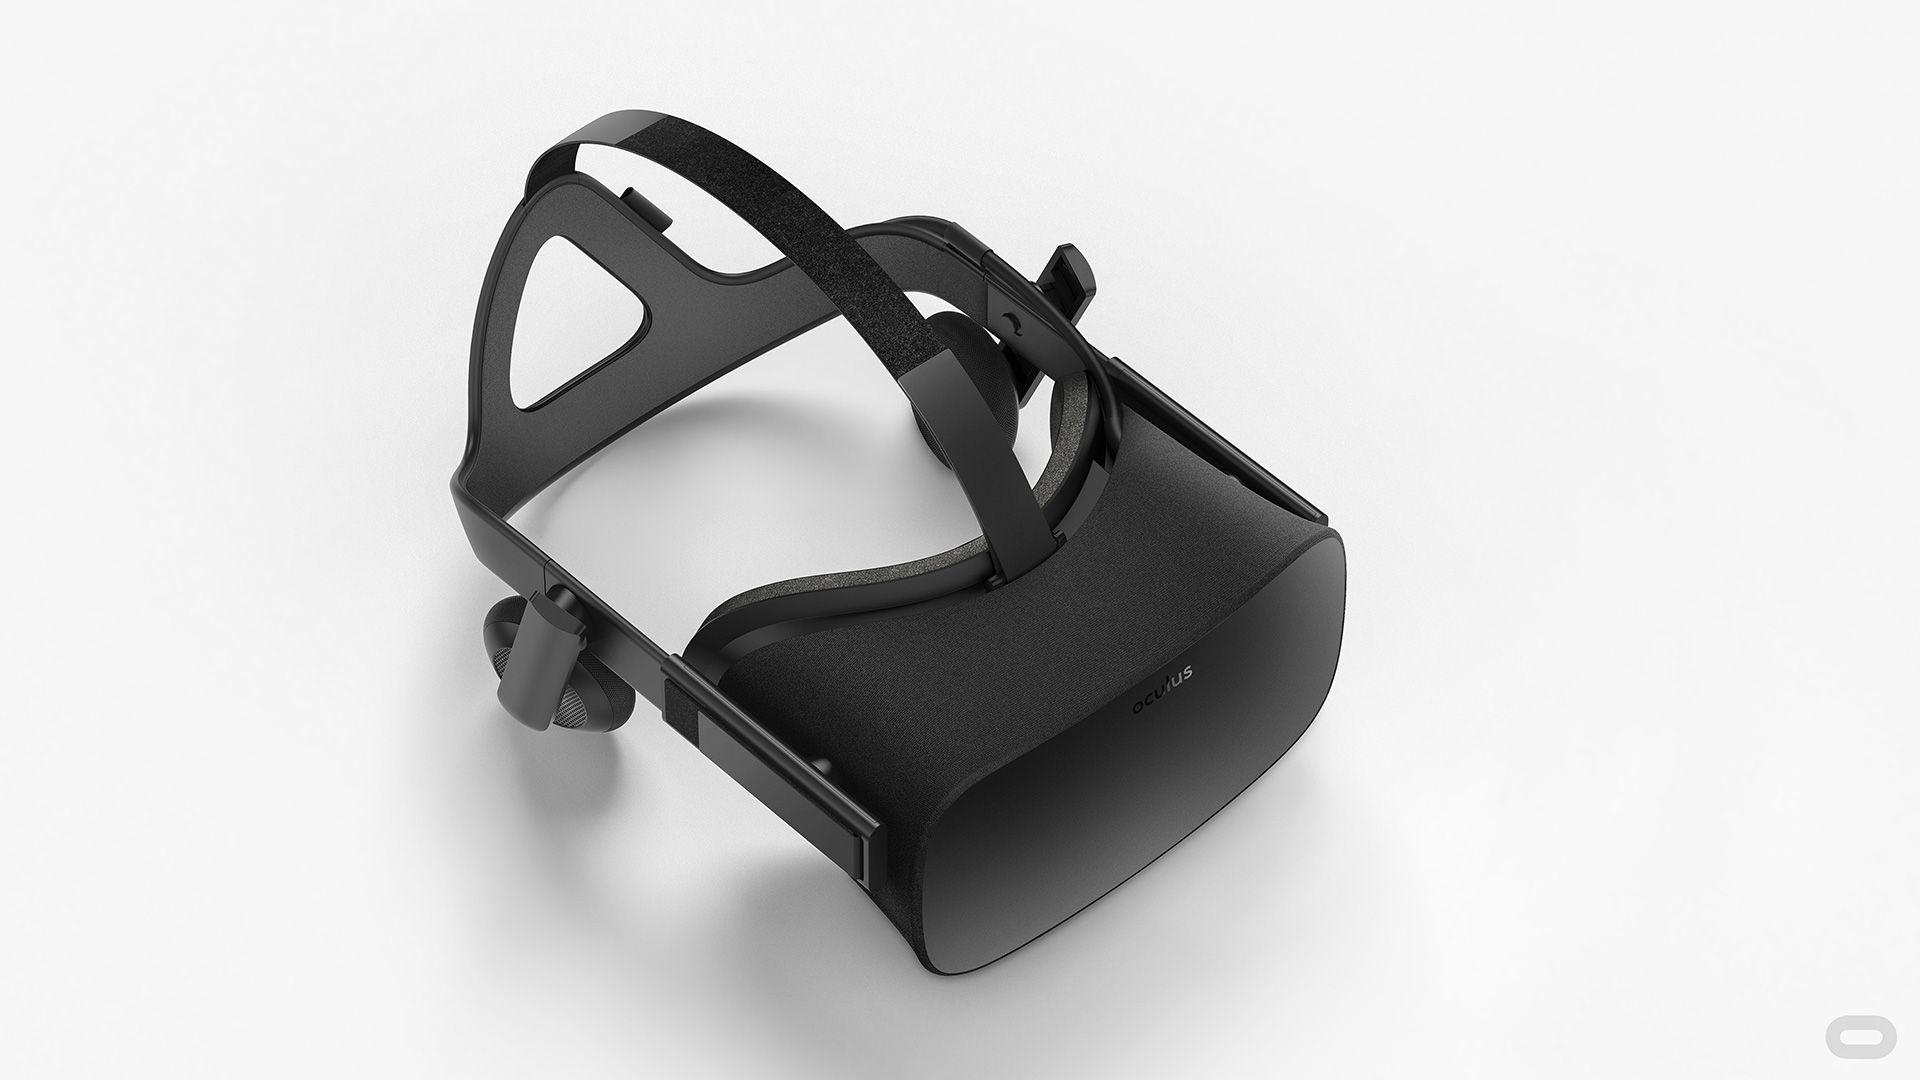 Oculus Rift retail product photo (angle) 1920